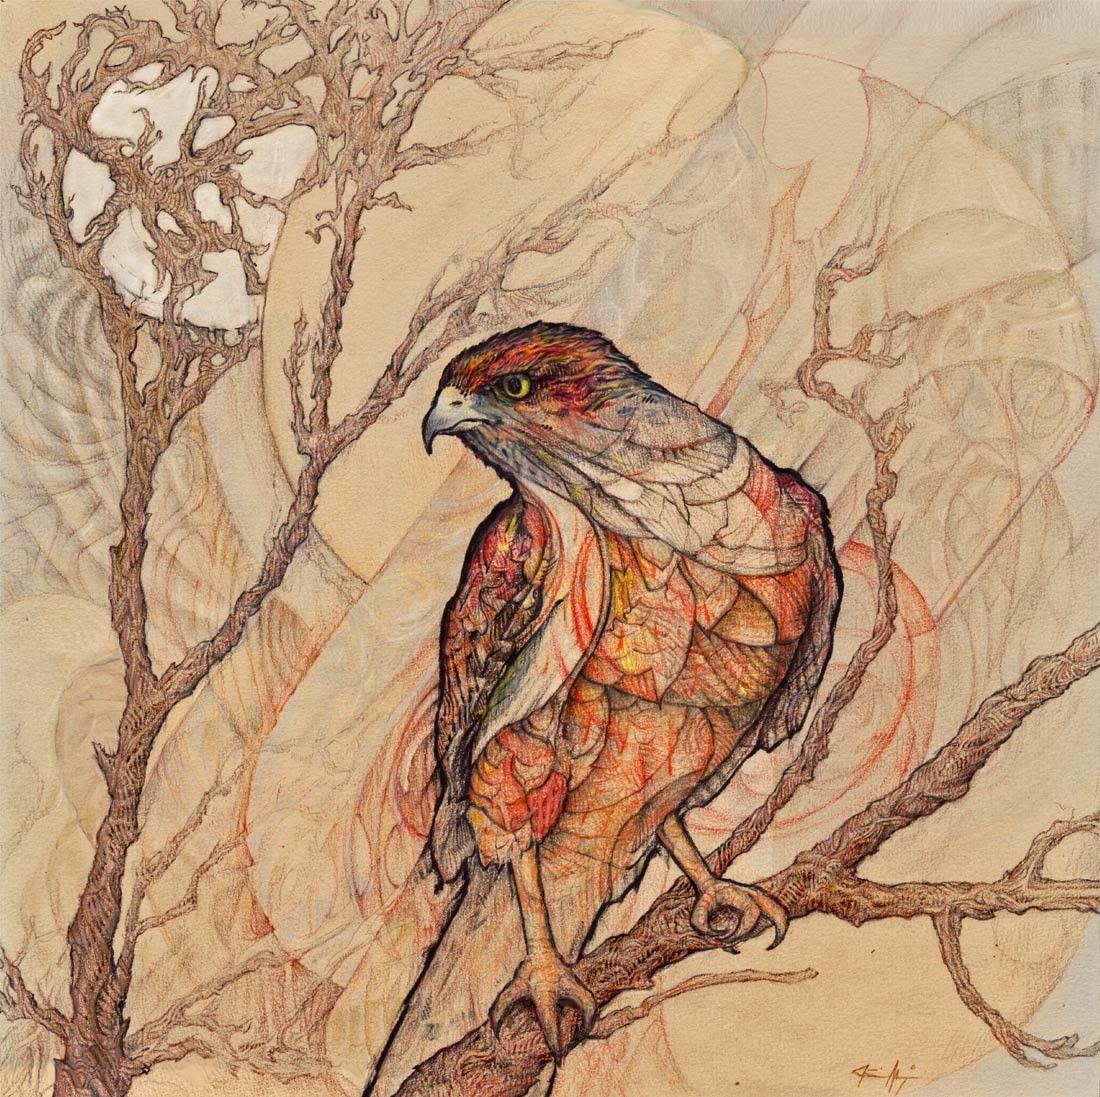 Color art printing anchorage - Hawk Art Print 13x13 By Inkfreeordye On Etsy 33 00